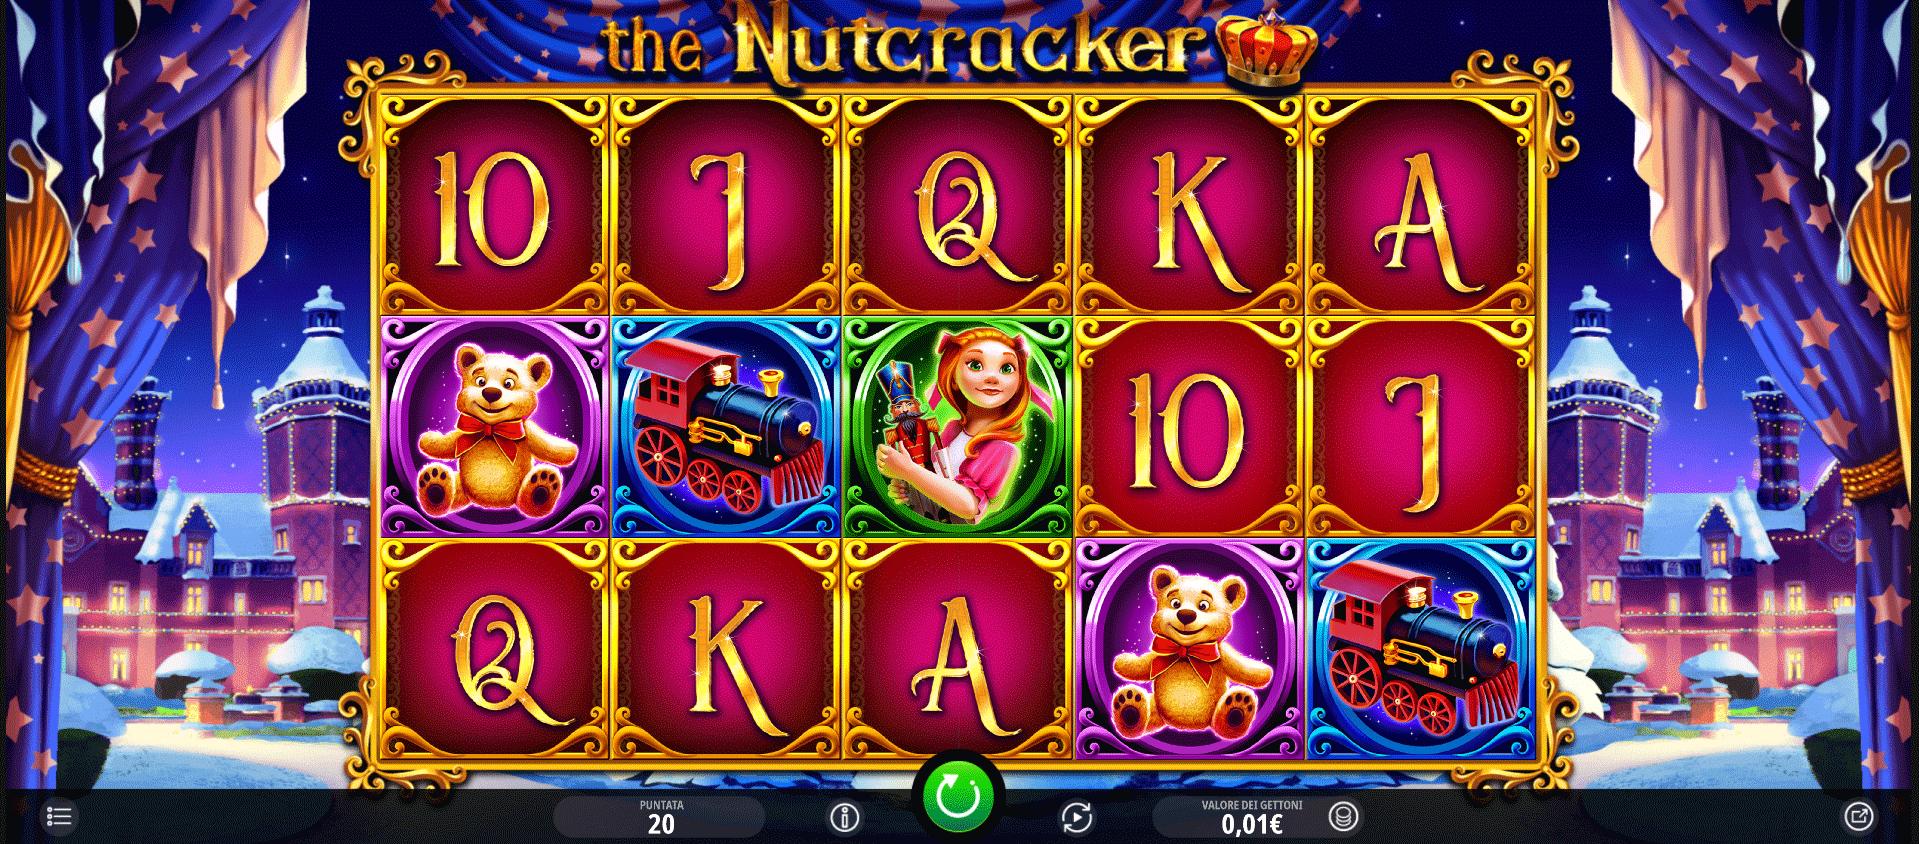 Slot The Nutcracker